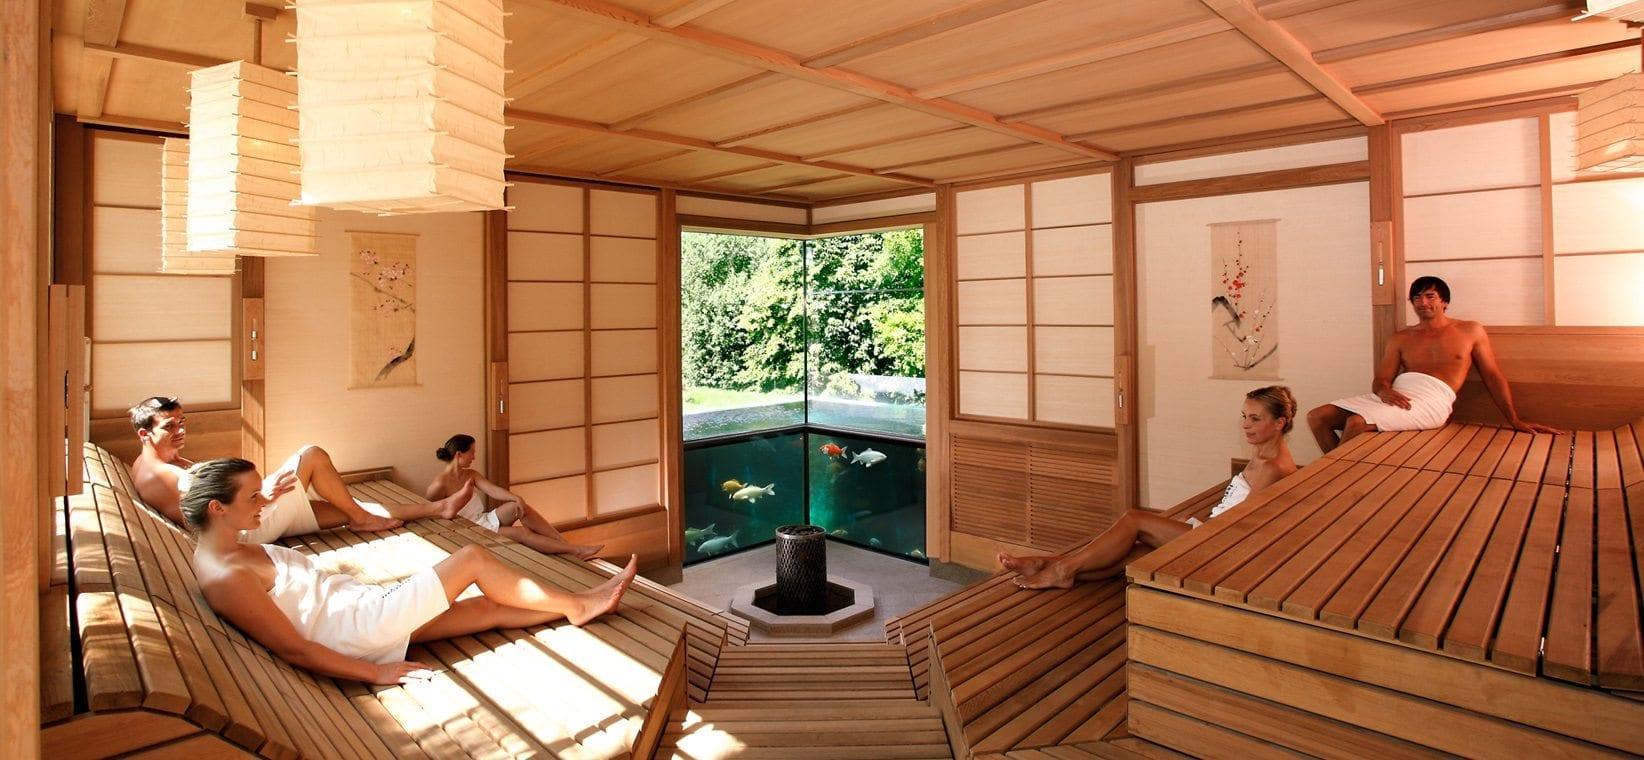 dampfbad blaue grotte 45 c sauna und dampfbad. Black Bedroom Furniture Sets. Home Design Ideas